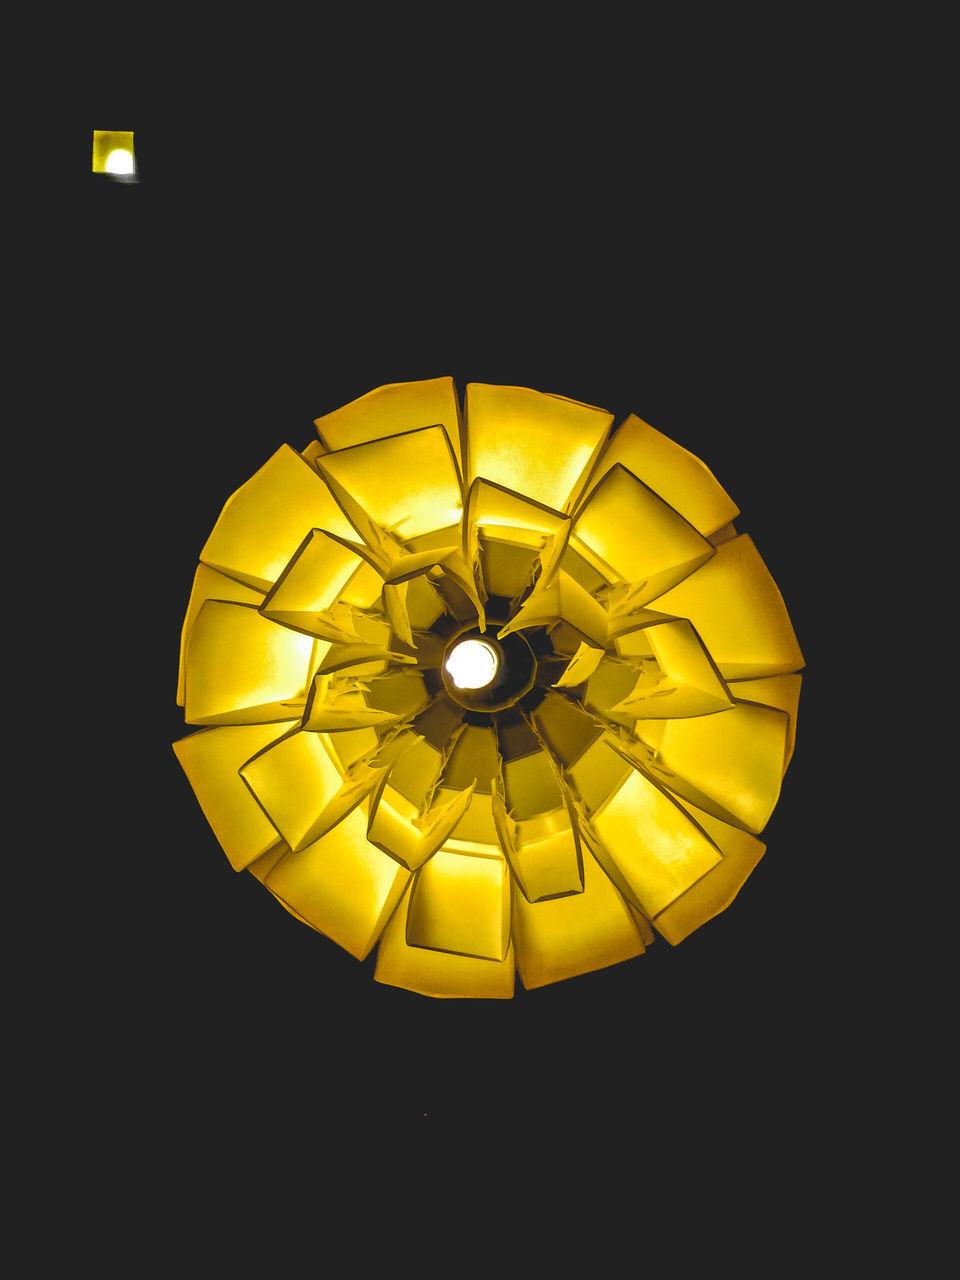 yellow, black background, illuminated, circle, night, gold colored, no people, studio shot, indoors, close-up